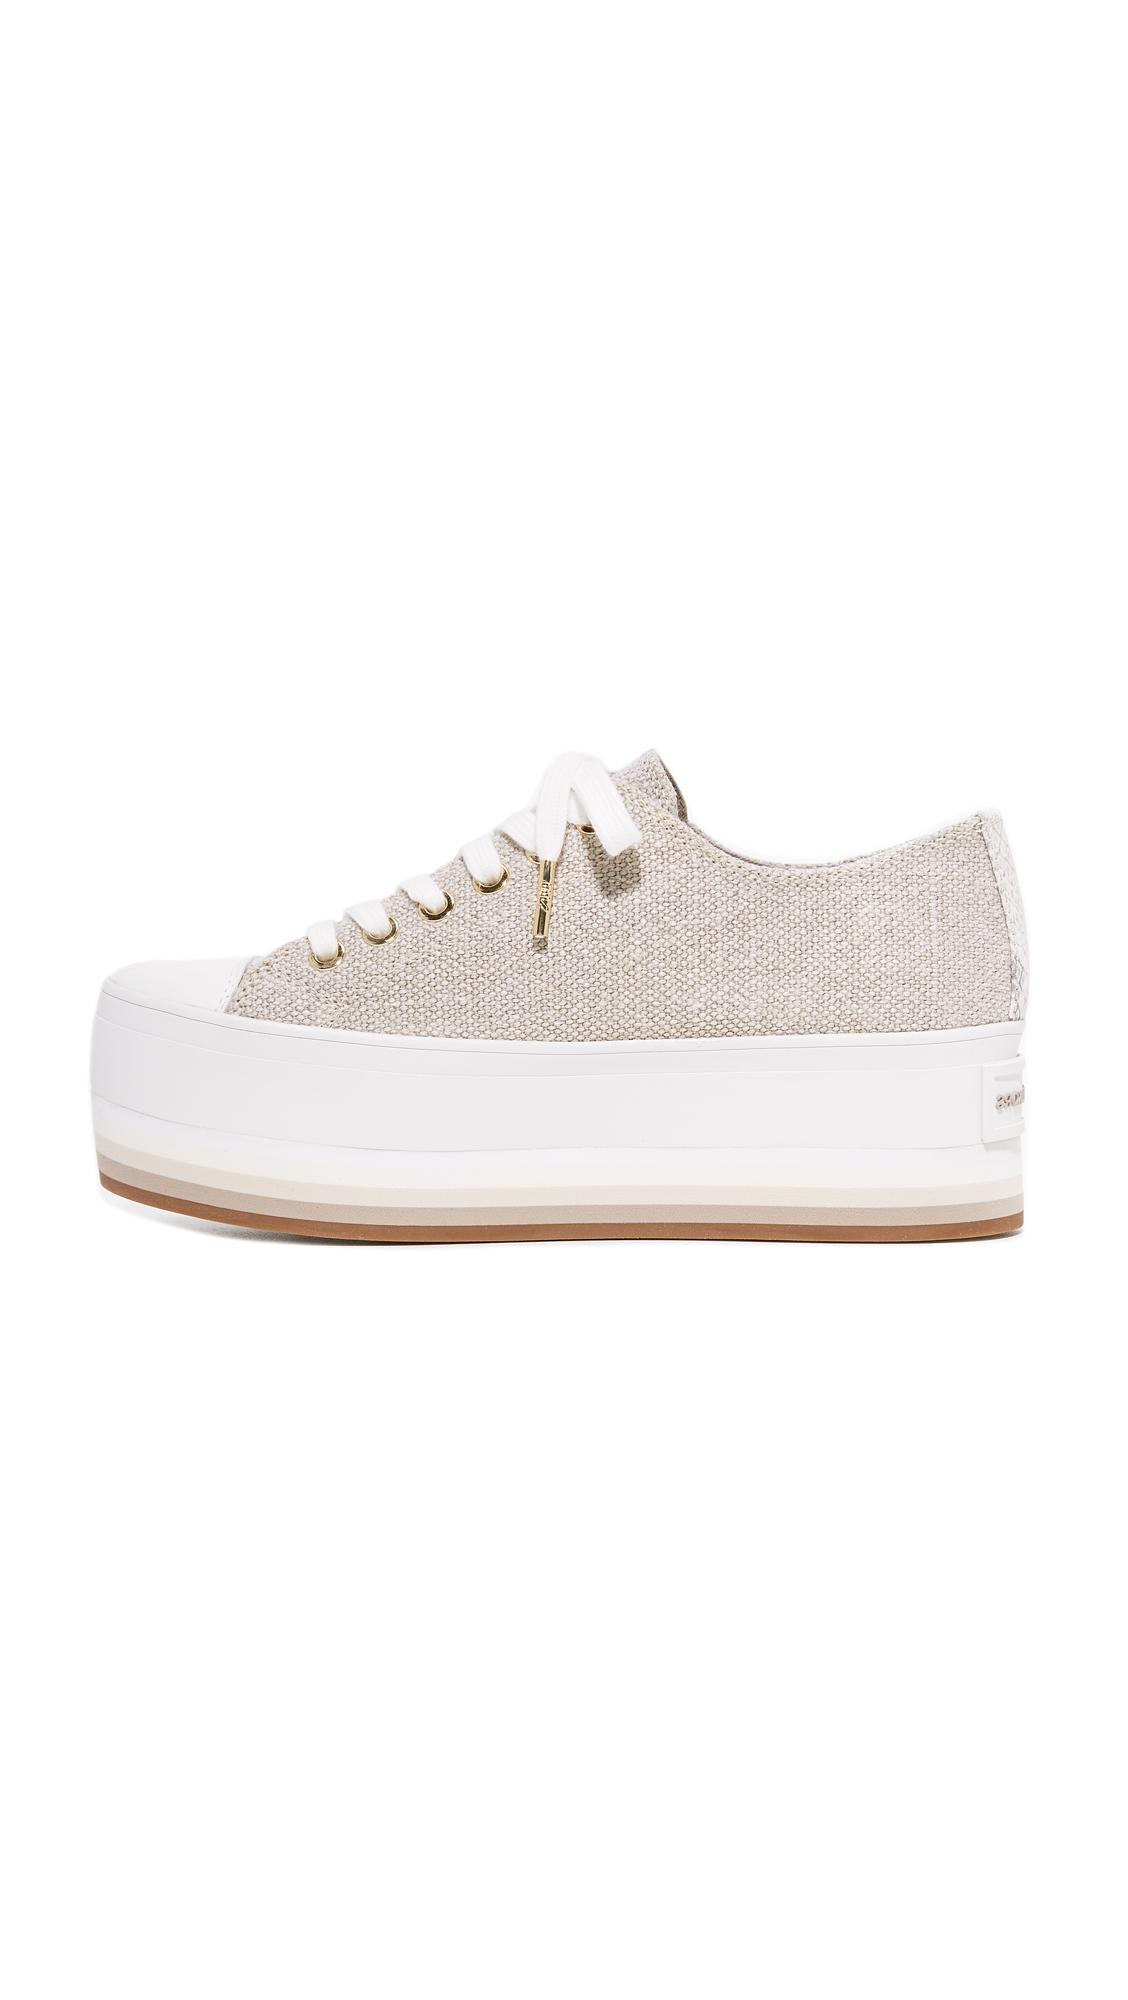 3f33b1f08a57 MICHAEL Michael Kors Ronnie Platform Sneakers